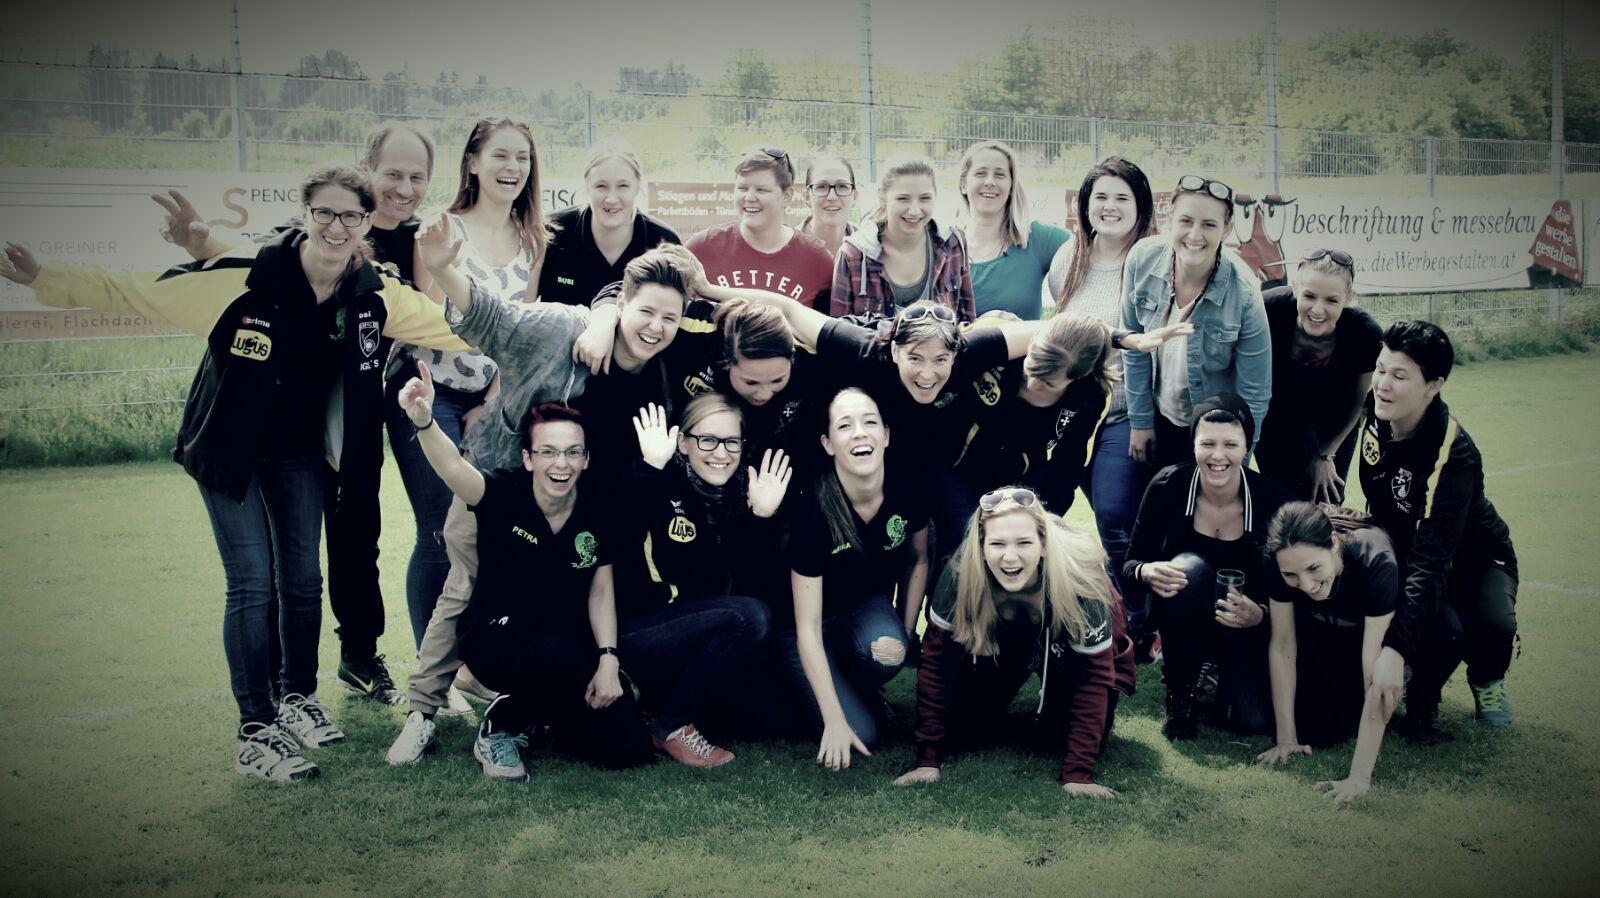 Igl's Turnier 2017